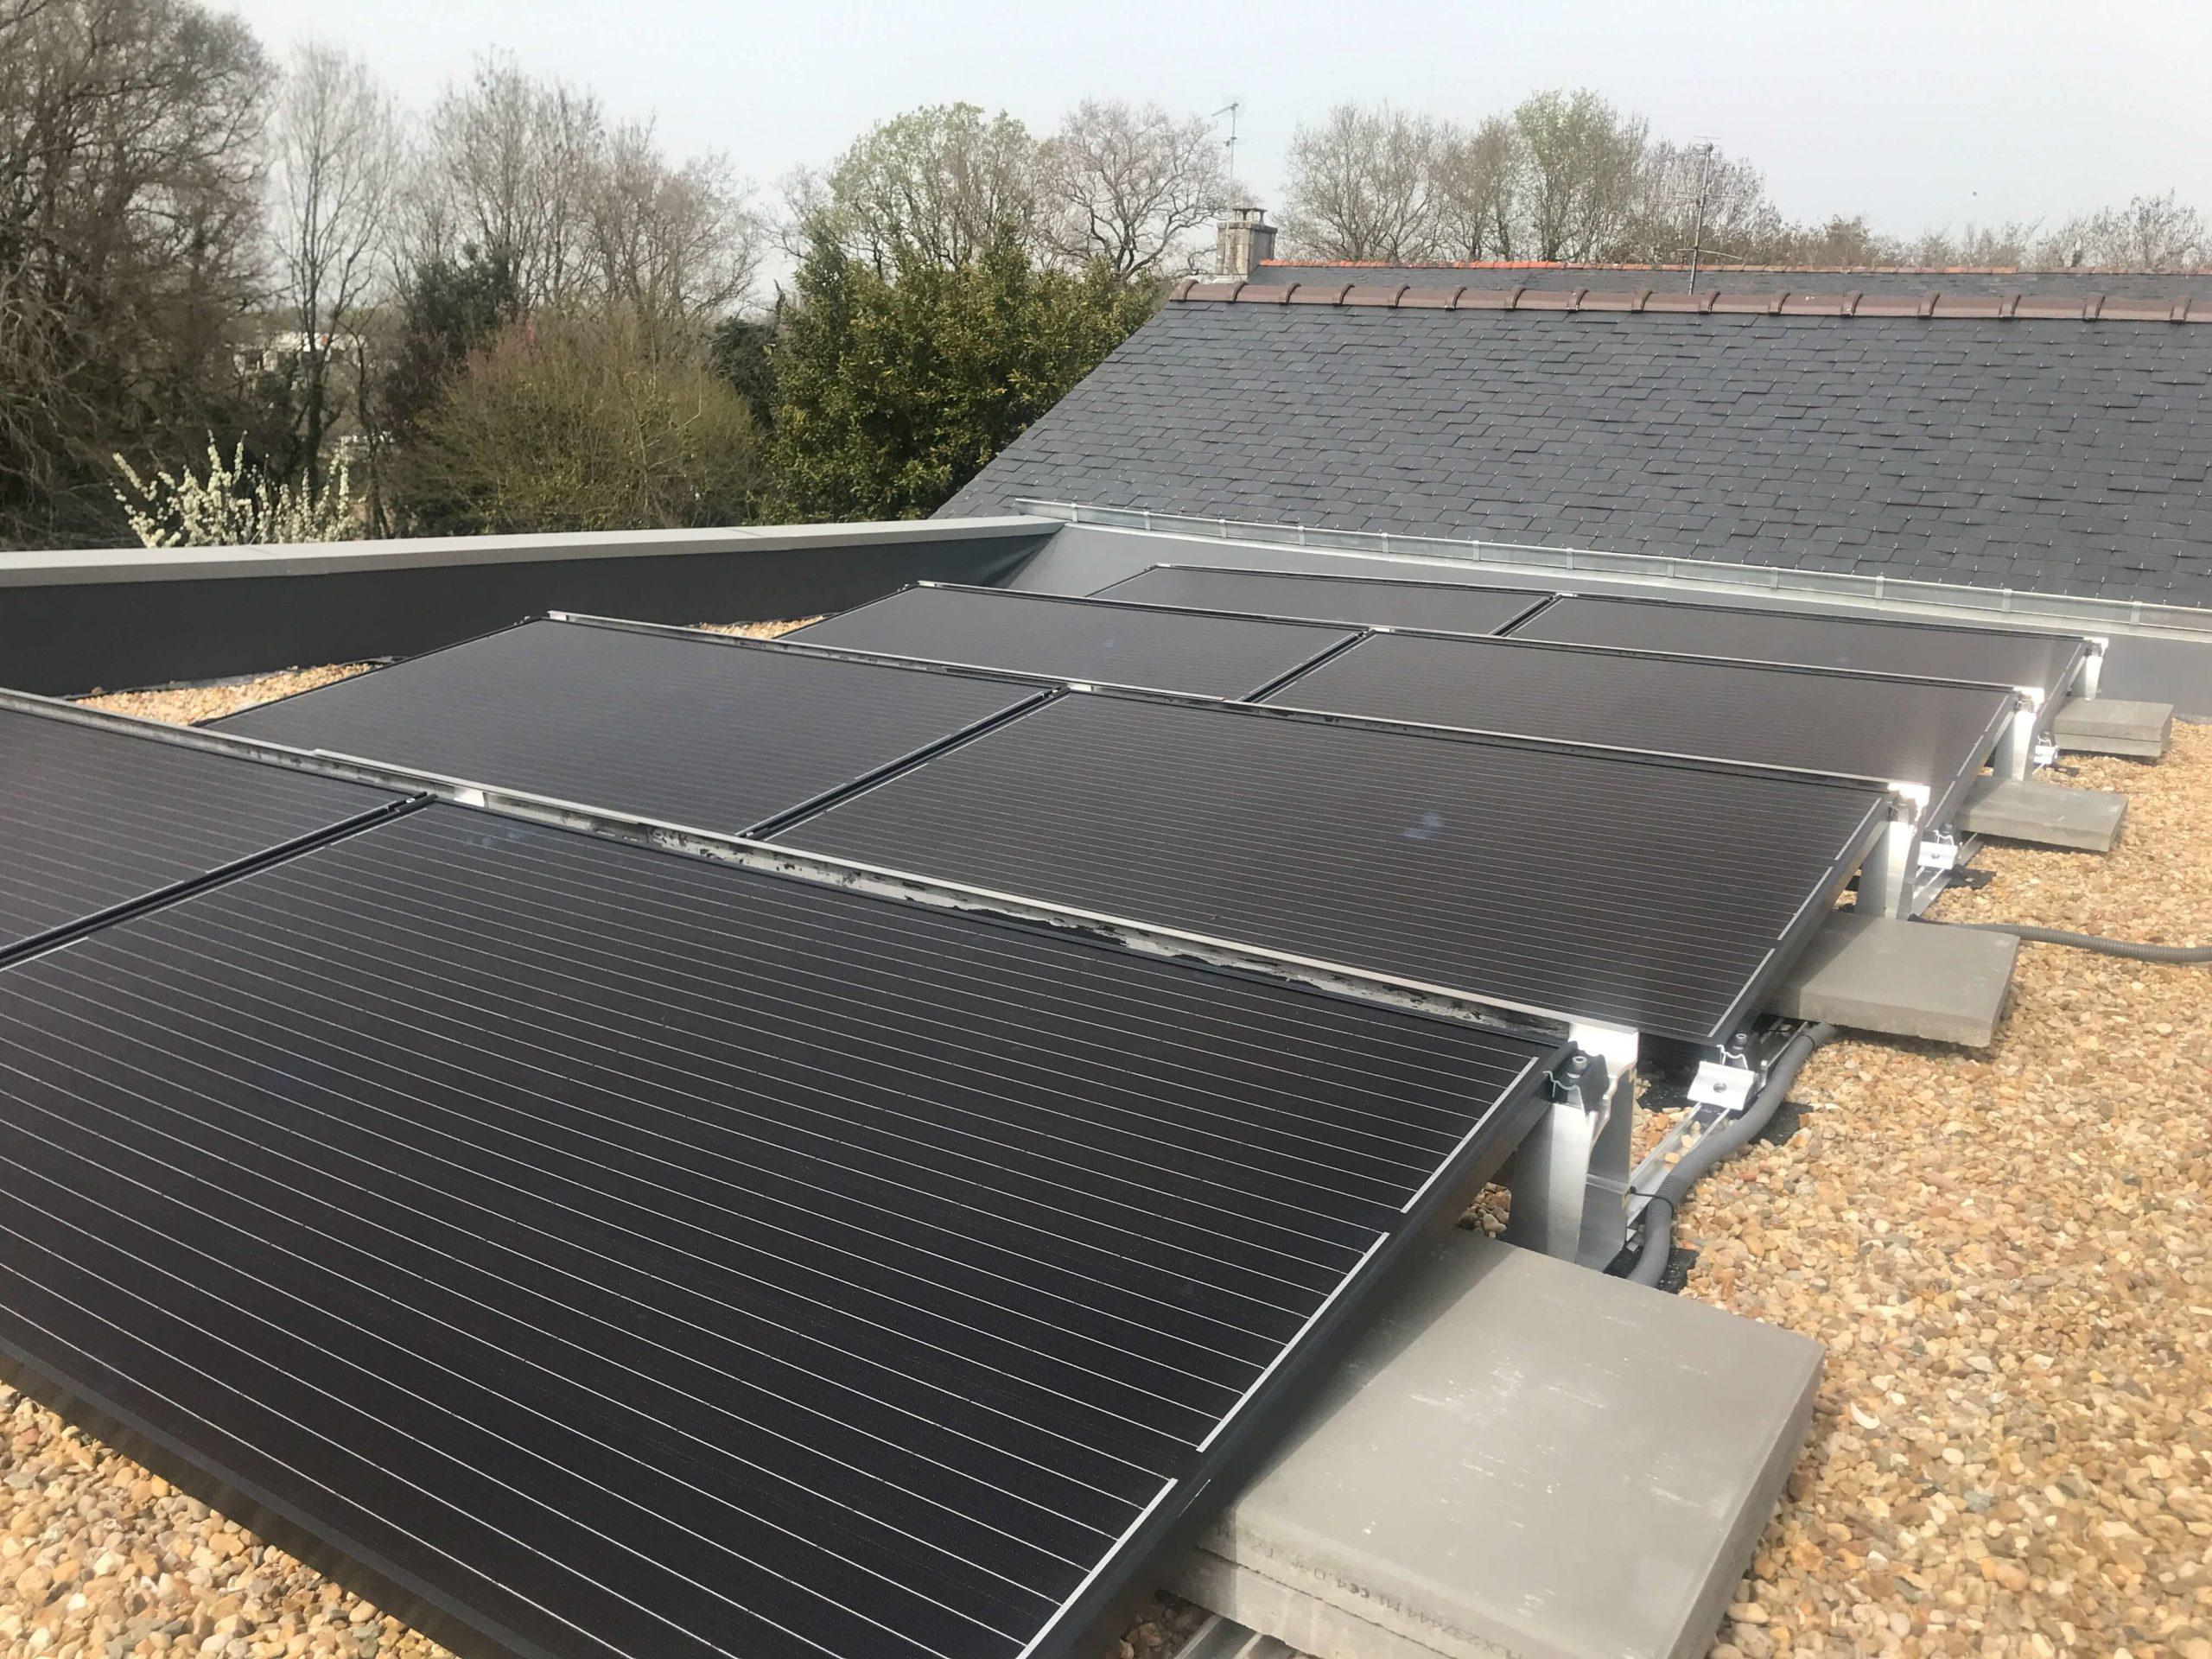 Installation Photovoltaique-Vannes-56-Circuit Court Energie